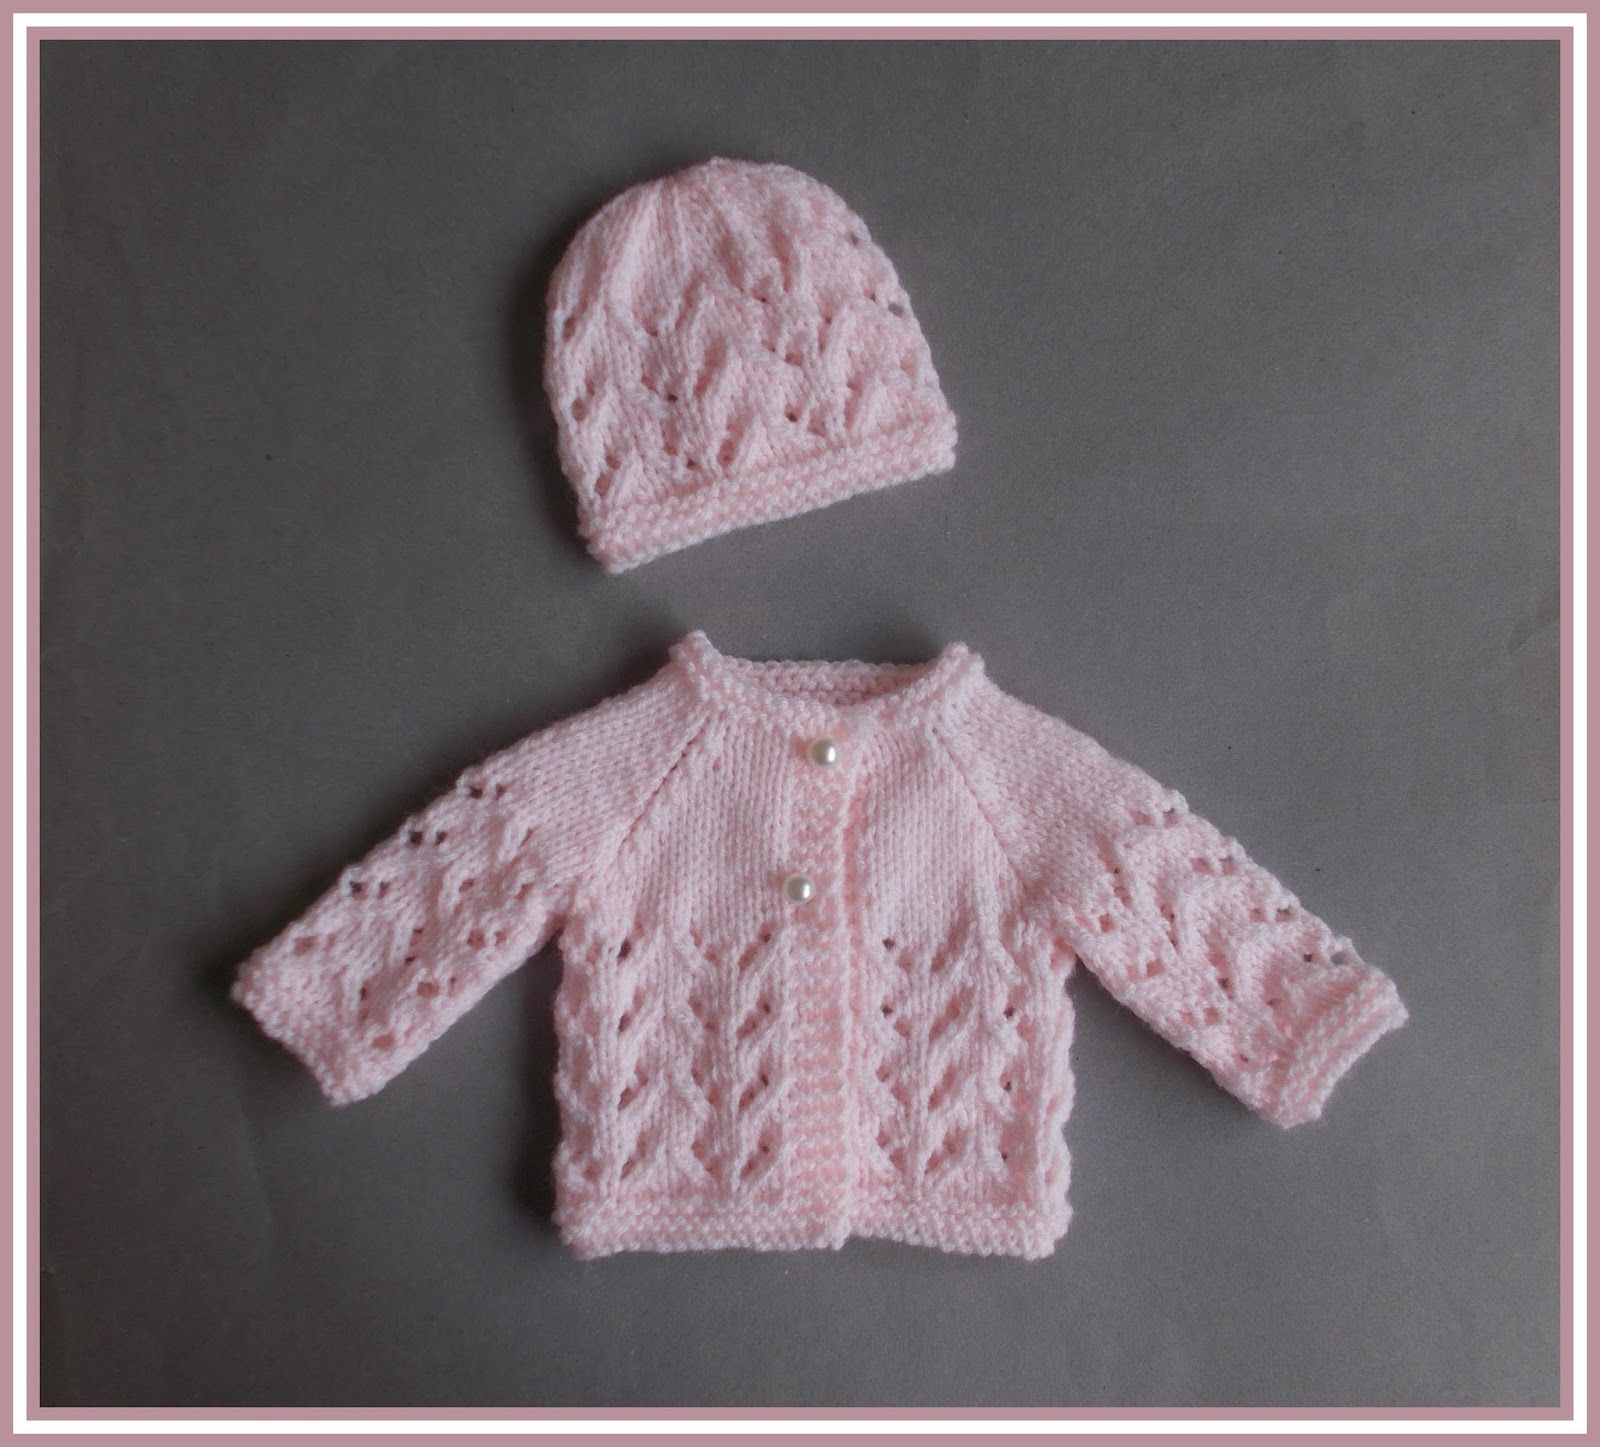 546740a81 marianna s lazy daisy days  Little Bibi - Preemie Baby Jacket   Hat ...